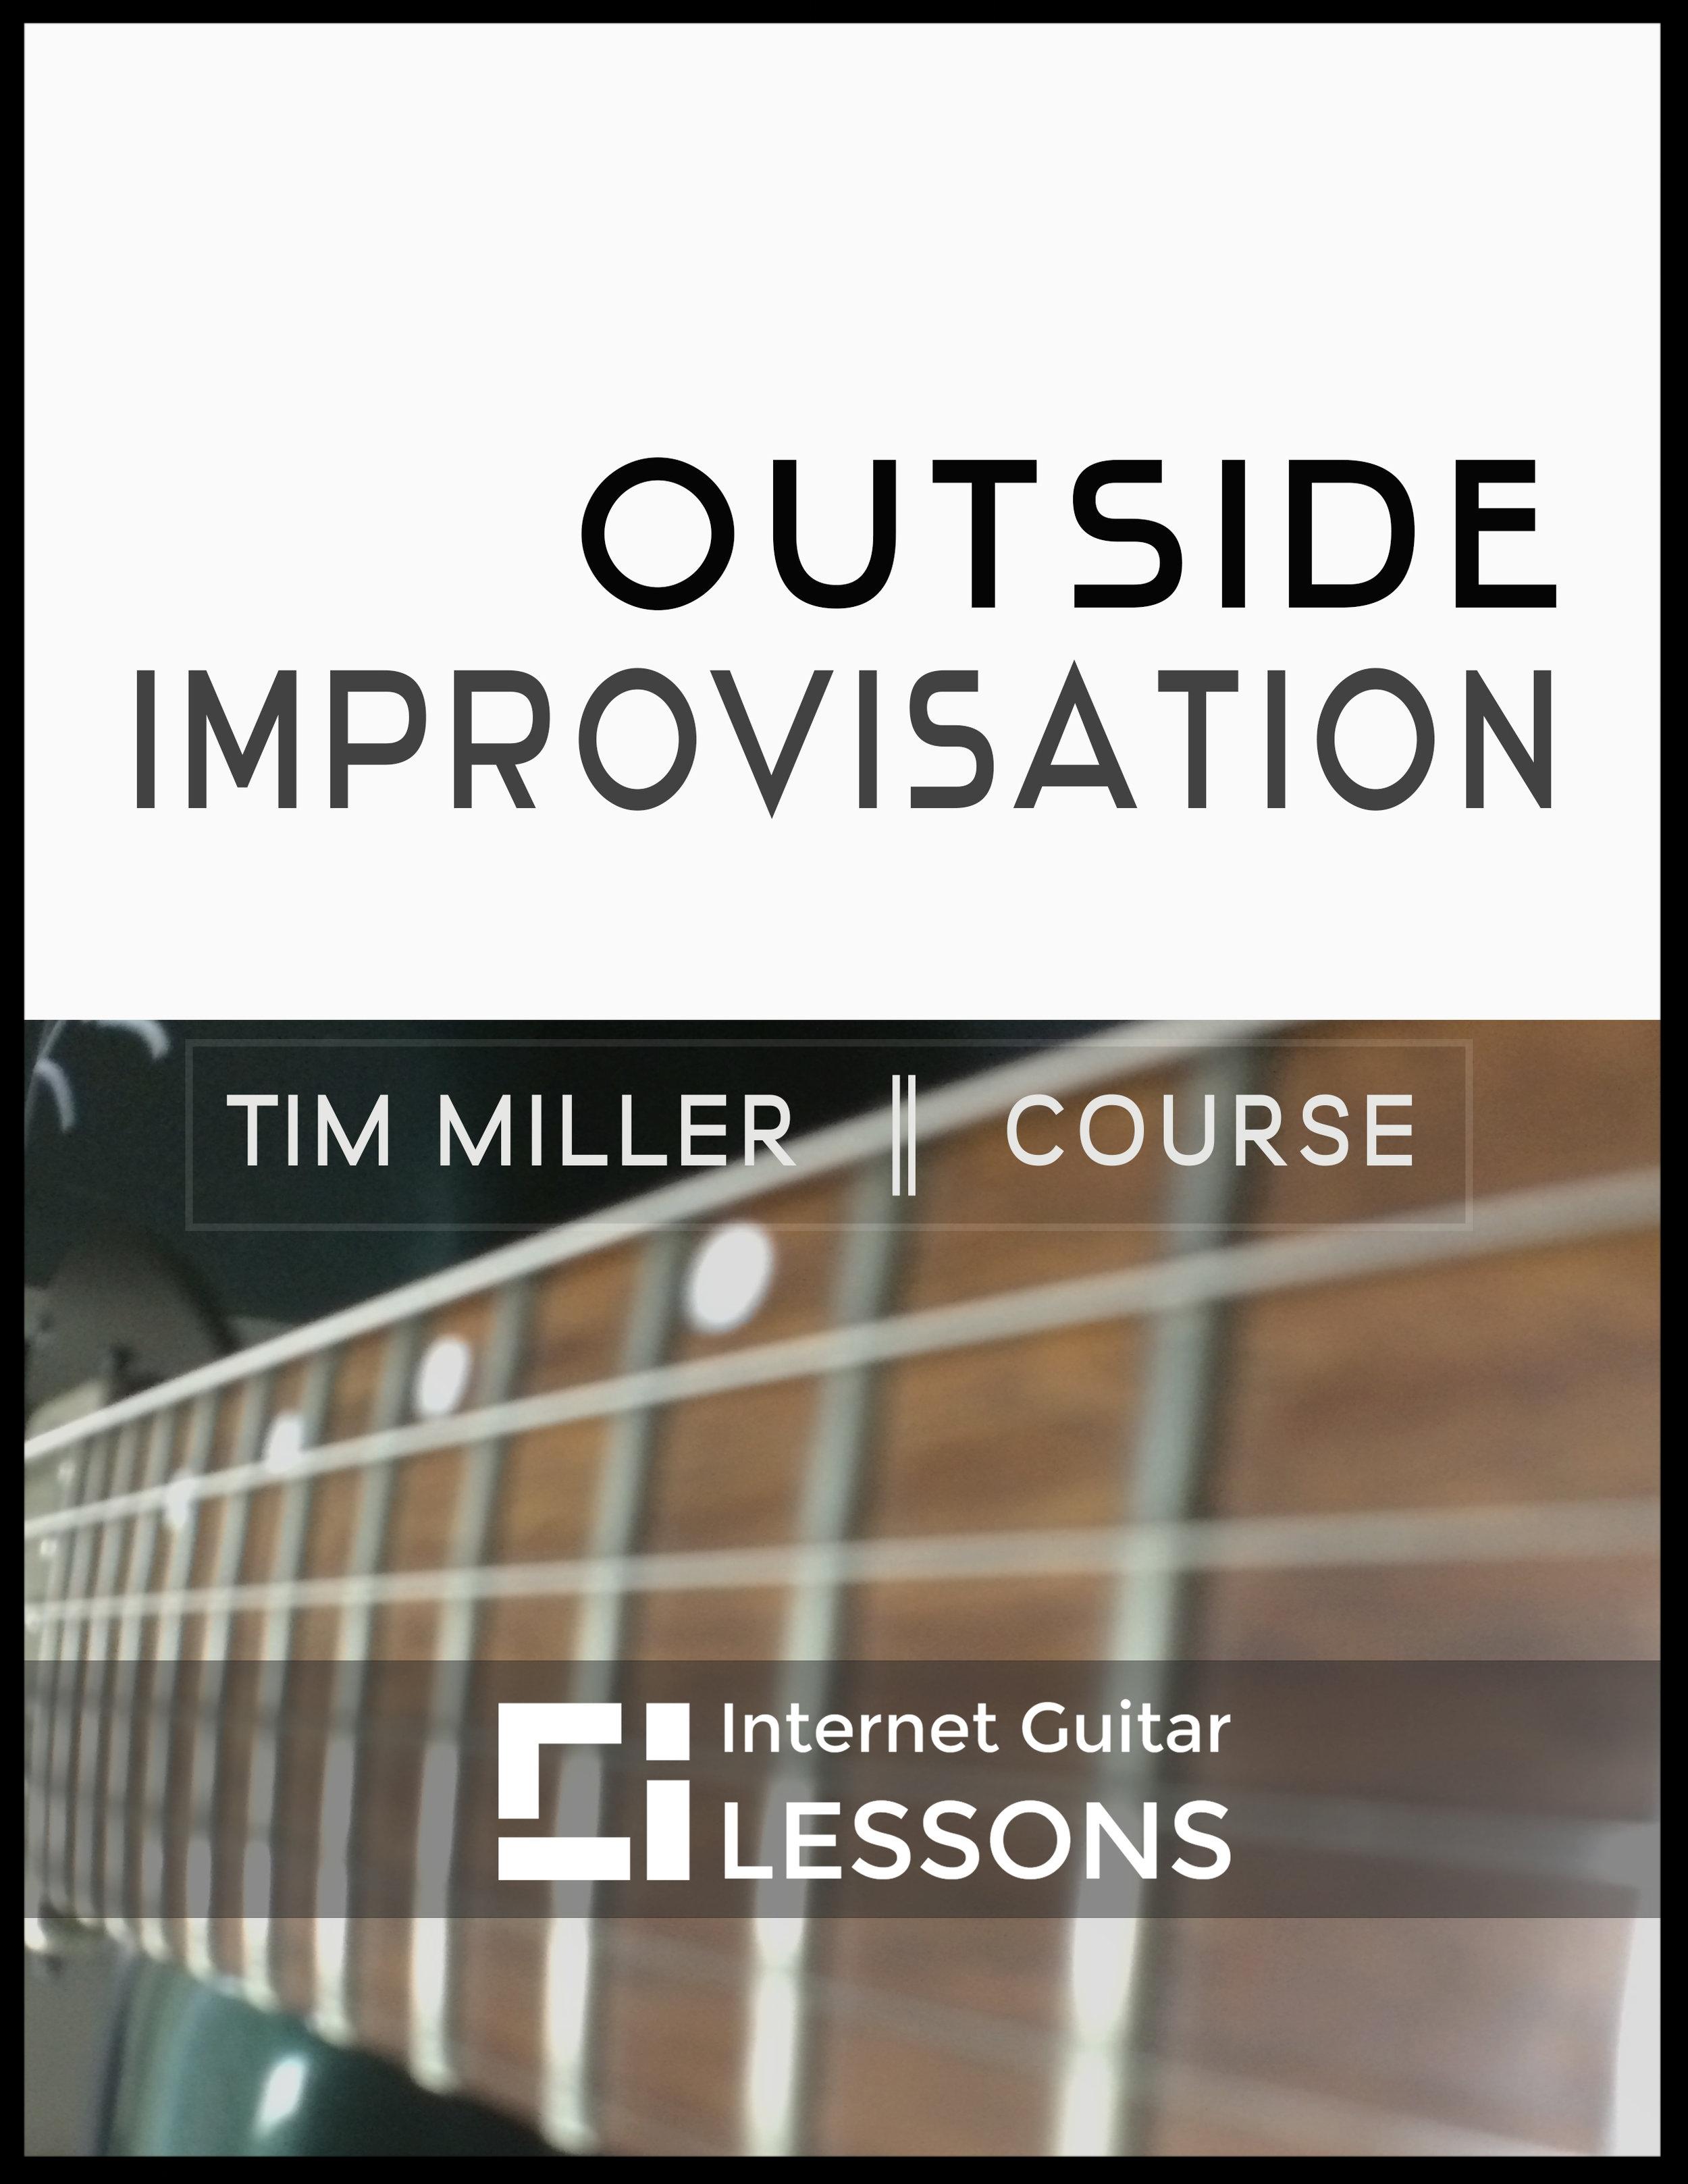 Outside Improvisation 1.17 flat.jpg